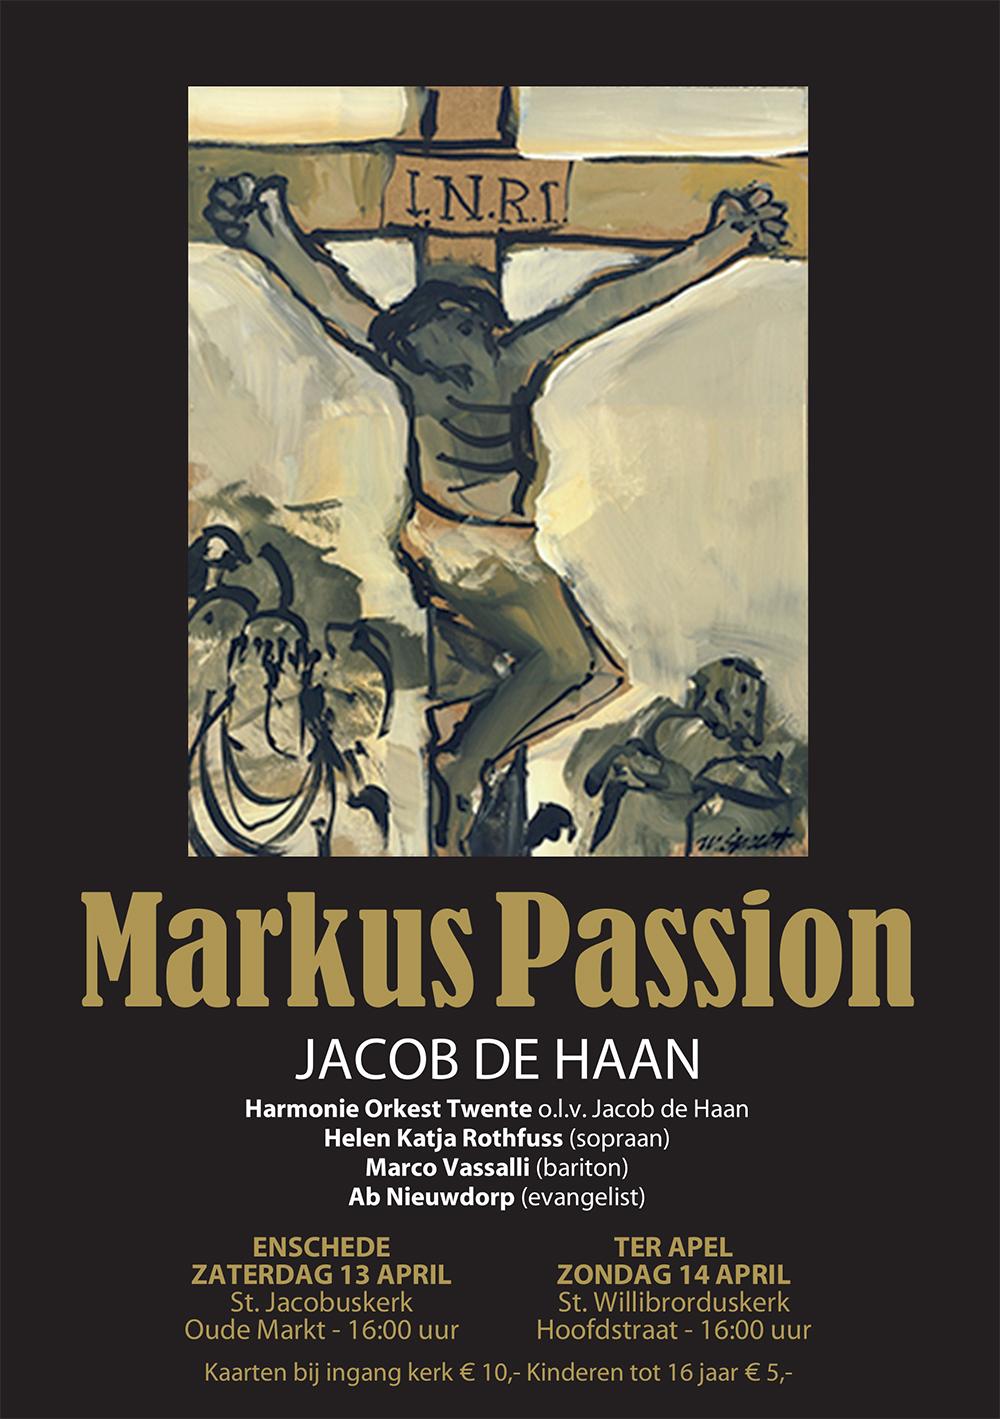 HOT Markus Passion 14 apr